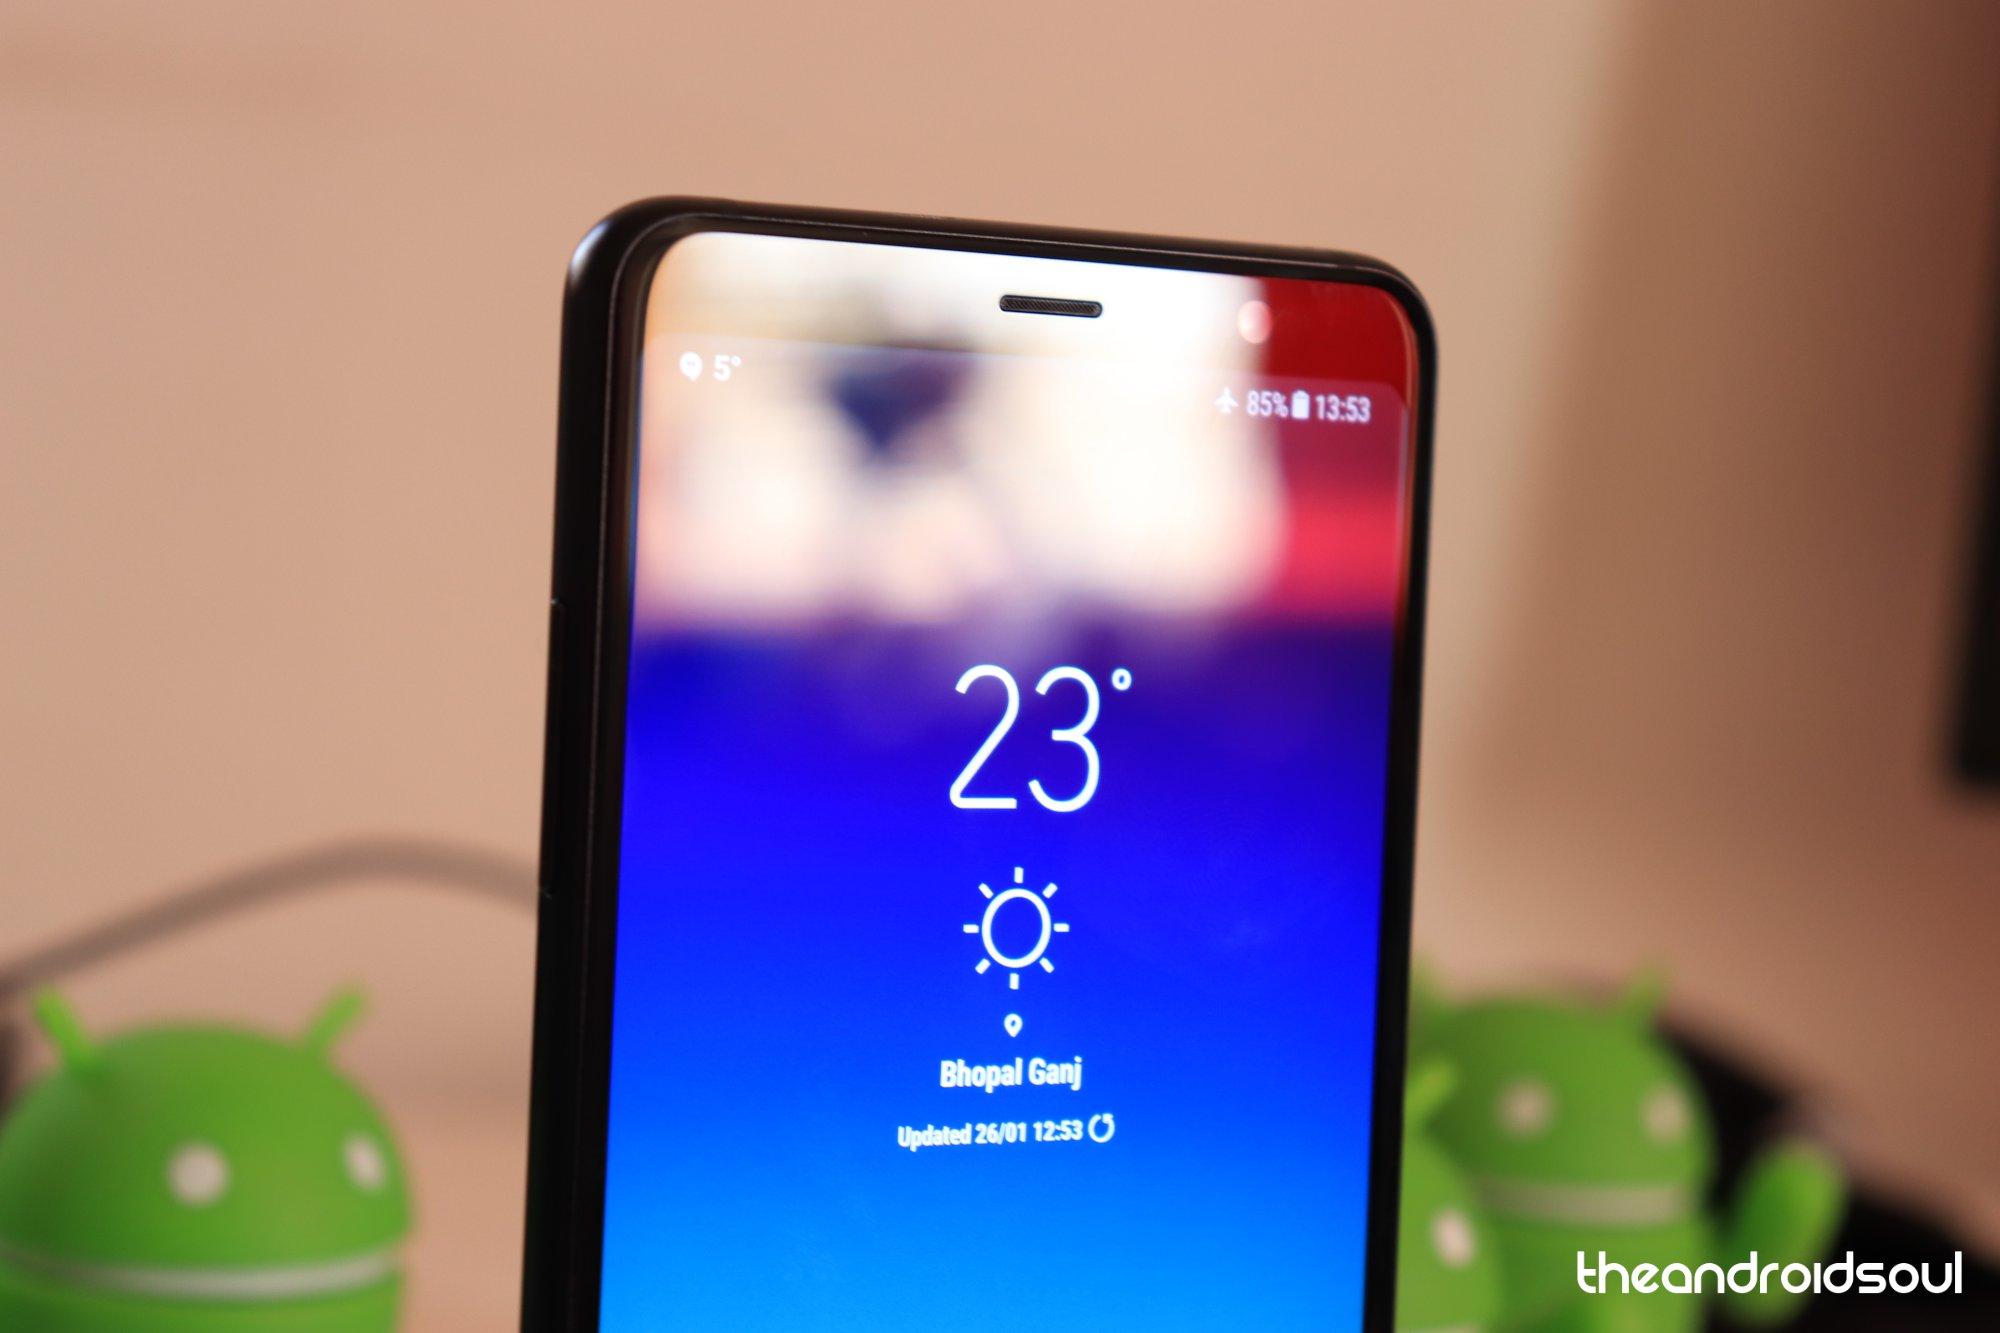 Samsung Galaxy A8 Plus phone